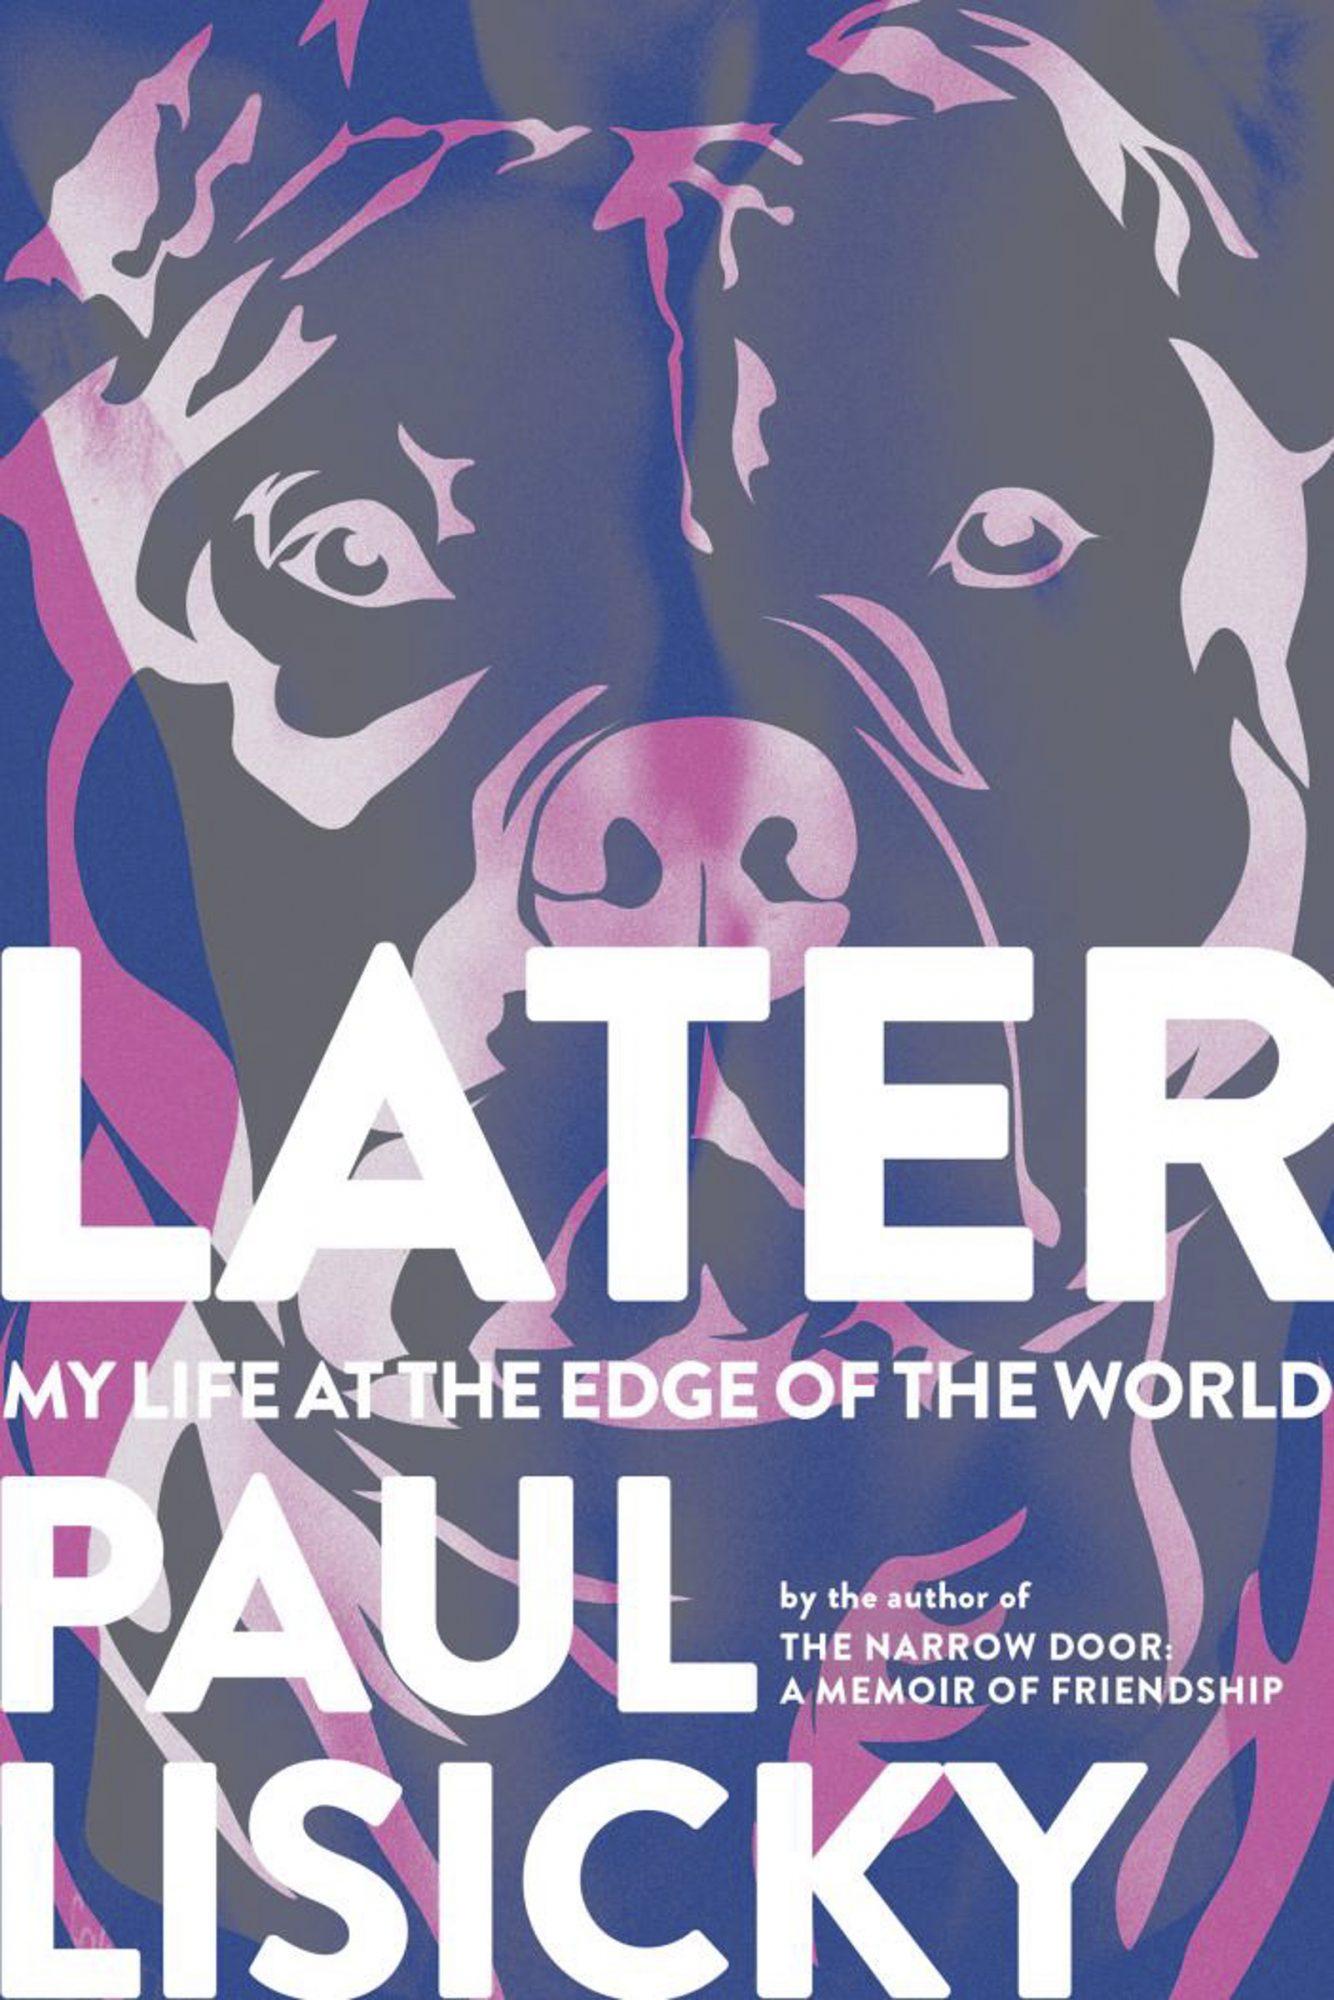 Henry HoltLater by Paul LisickyCR: Graywolf Press